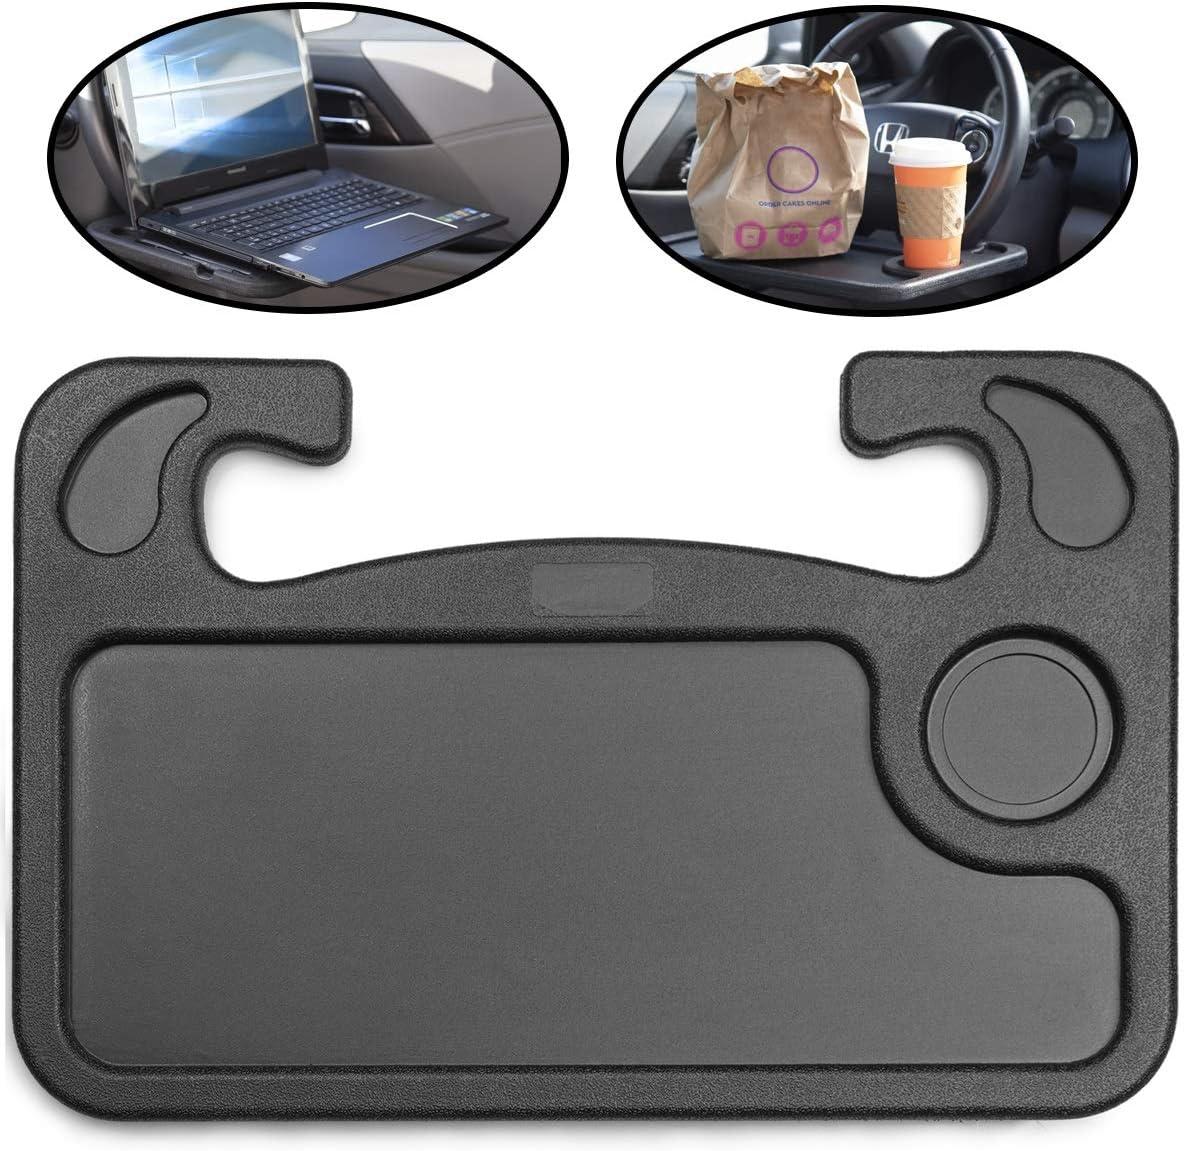 McGuffey Steering Wheel Tray Steering Wheel Desk Fits Most Vehicles Steering Wheels Auto Car Tray fit Notebook Tablet Ipad Working on Cars Black Pack of 1